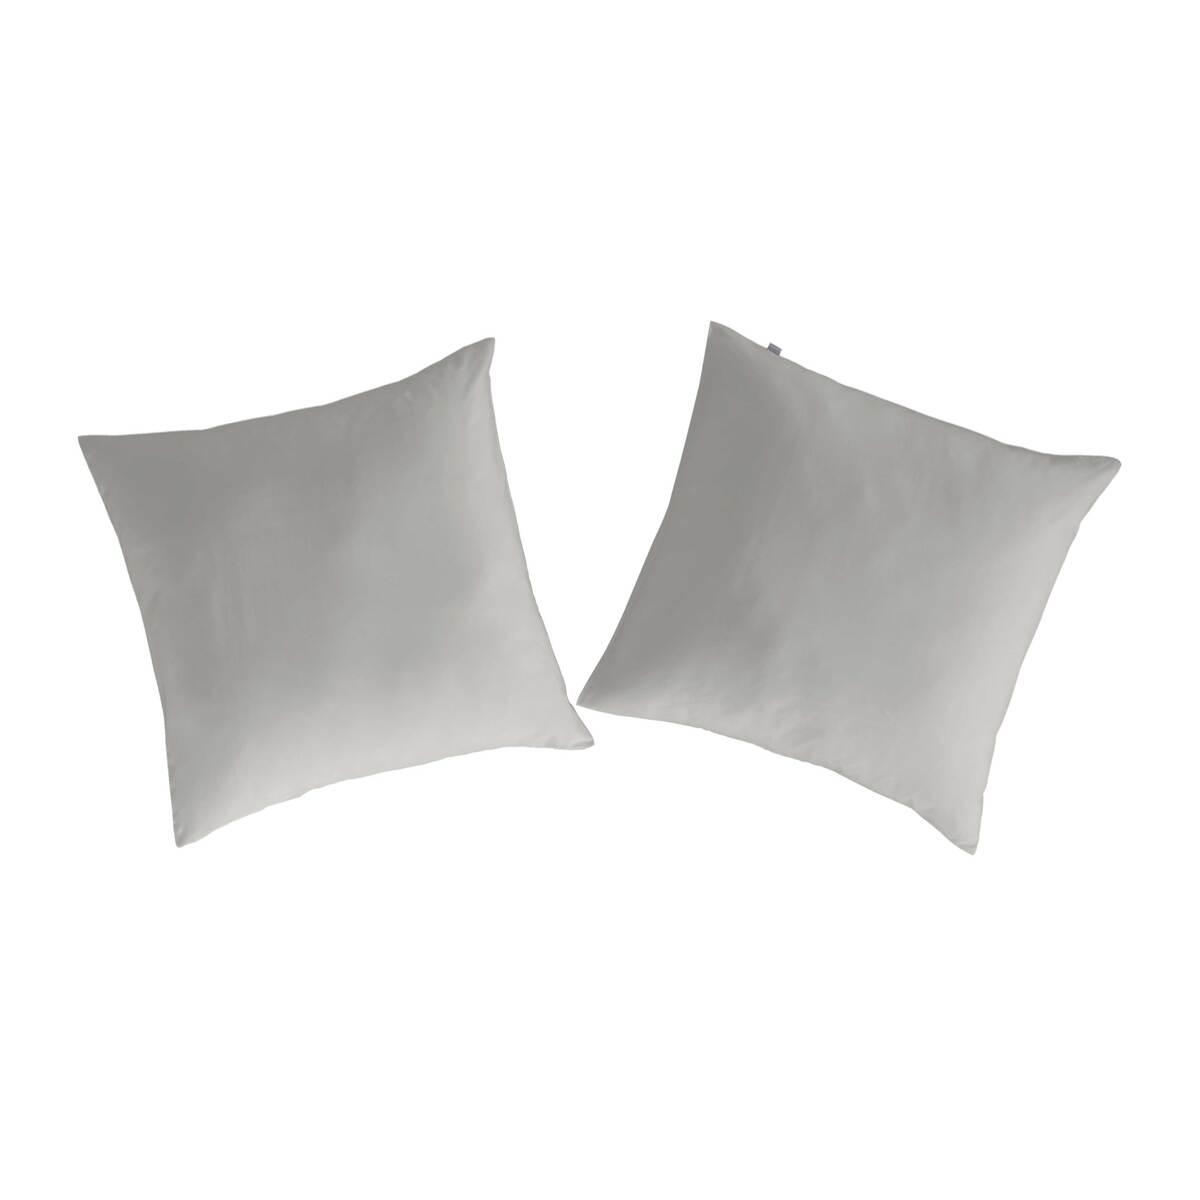 2 taies d'oreiller en coton gris 65x65